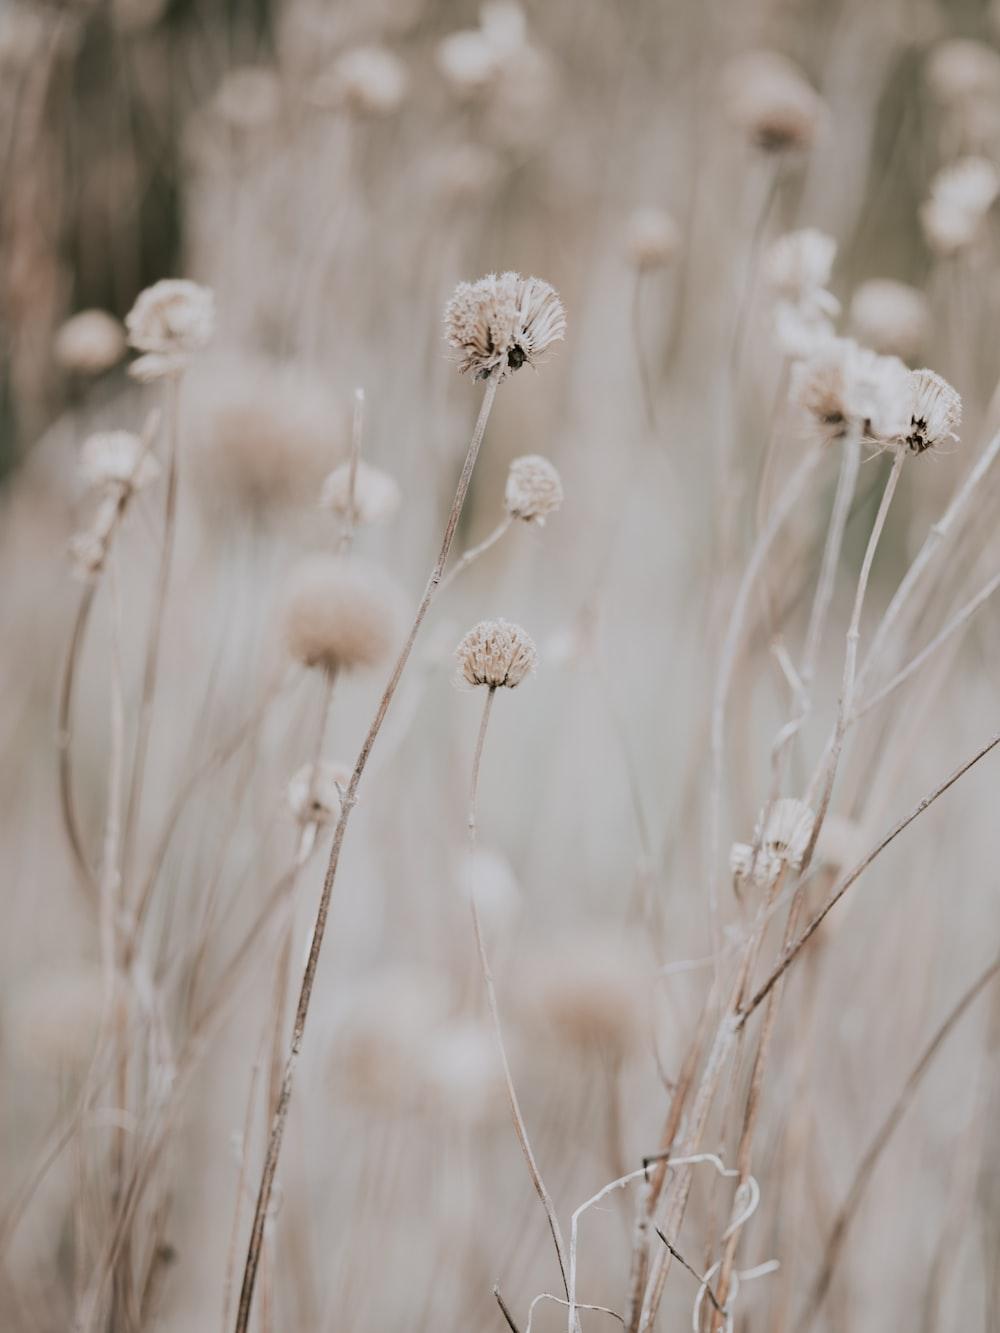 closeup photo of dandelion